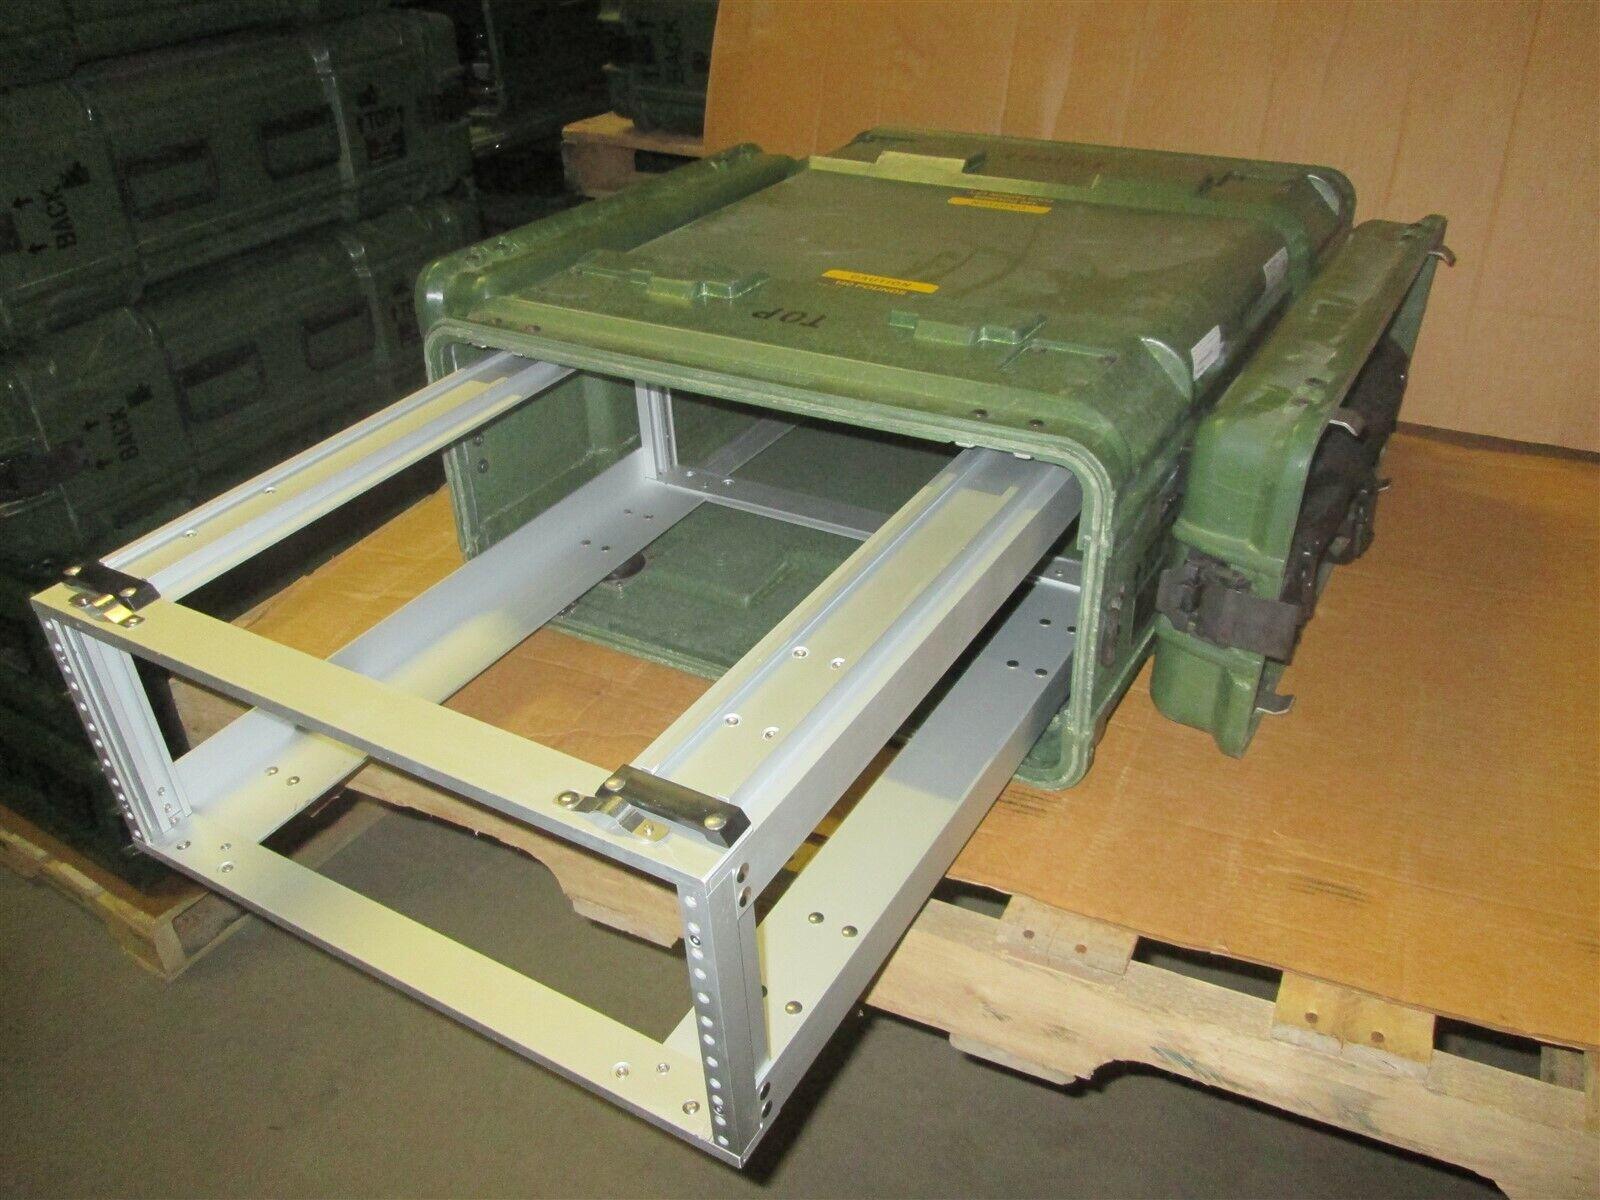 Rackmount 04U x24 Slide Out General Dynamics Composite Shock Mount Rack Case A1